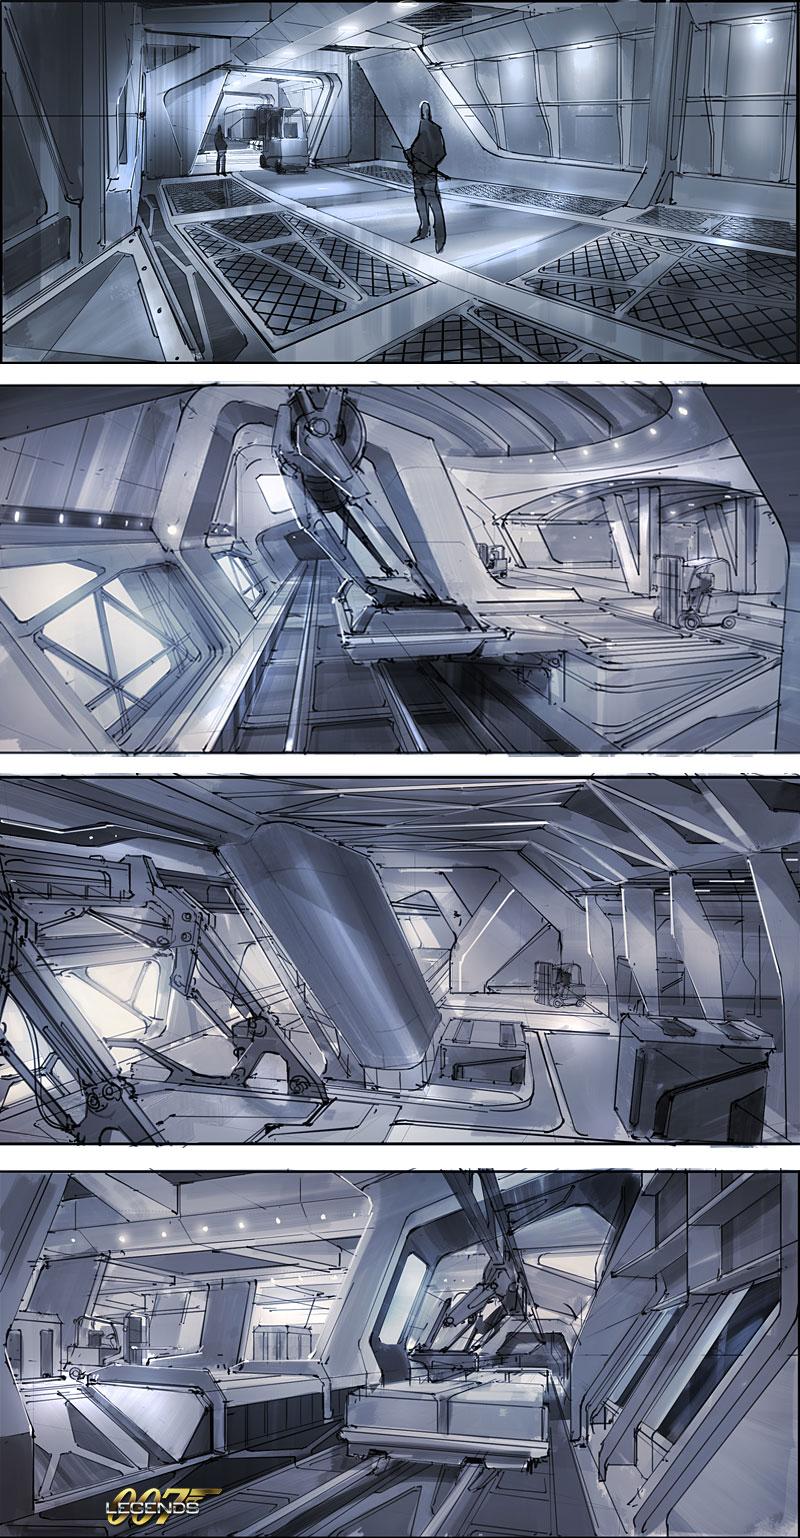 007-legends-moonraker-art-6